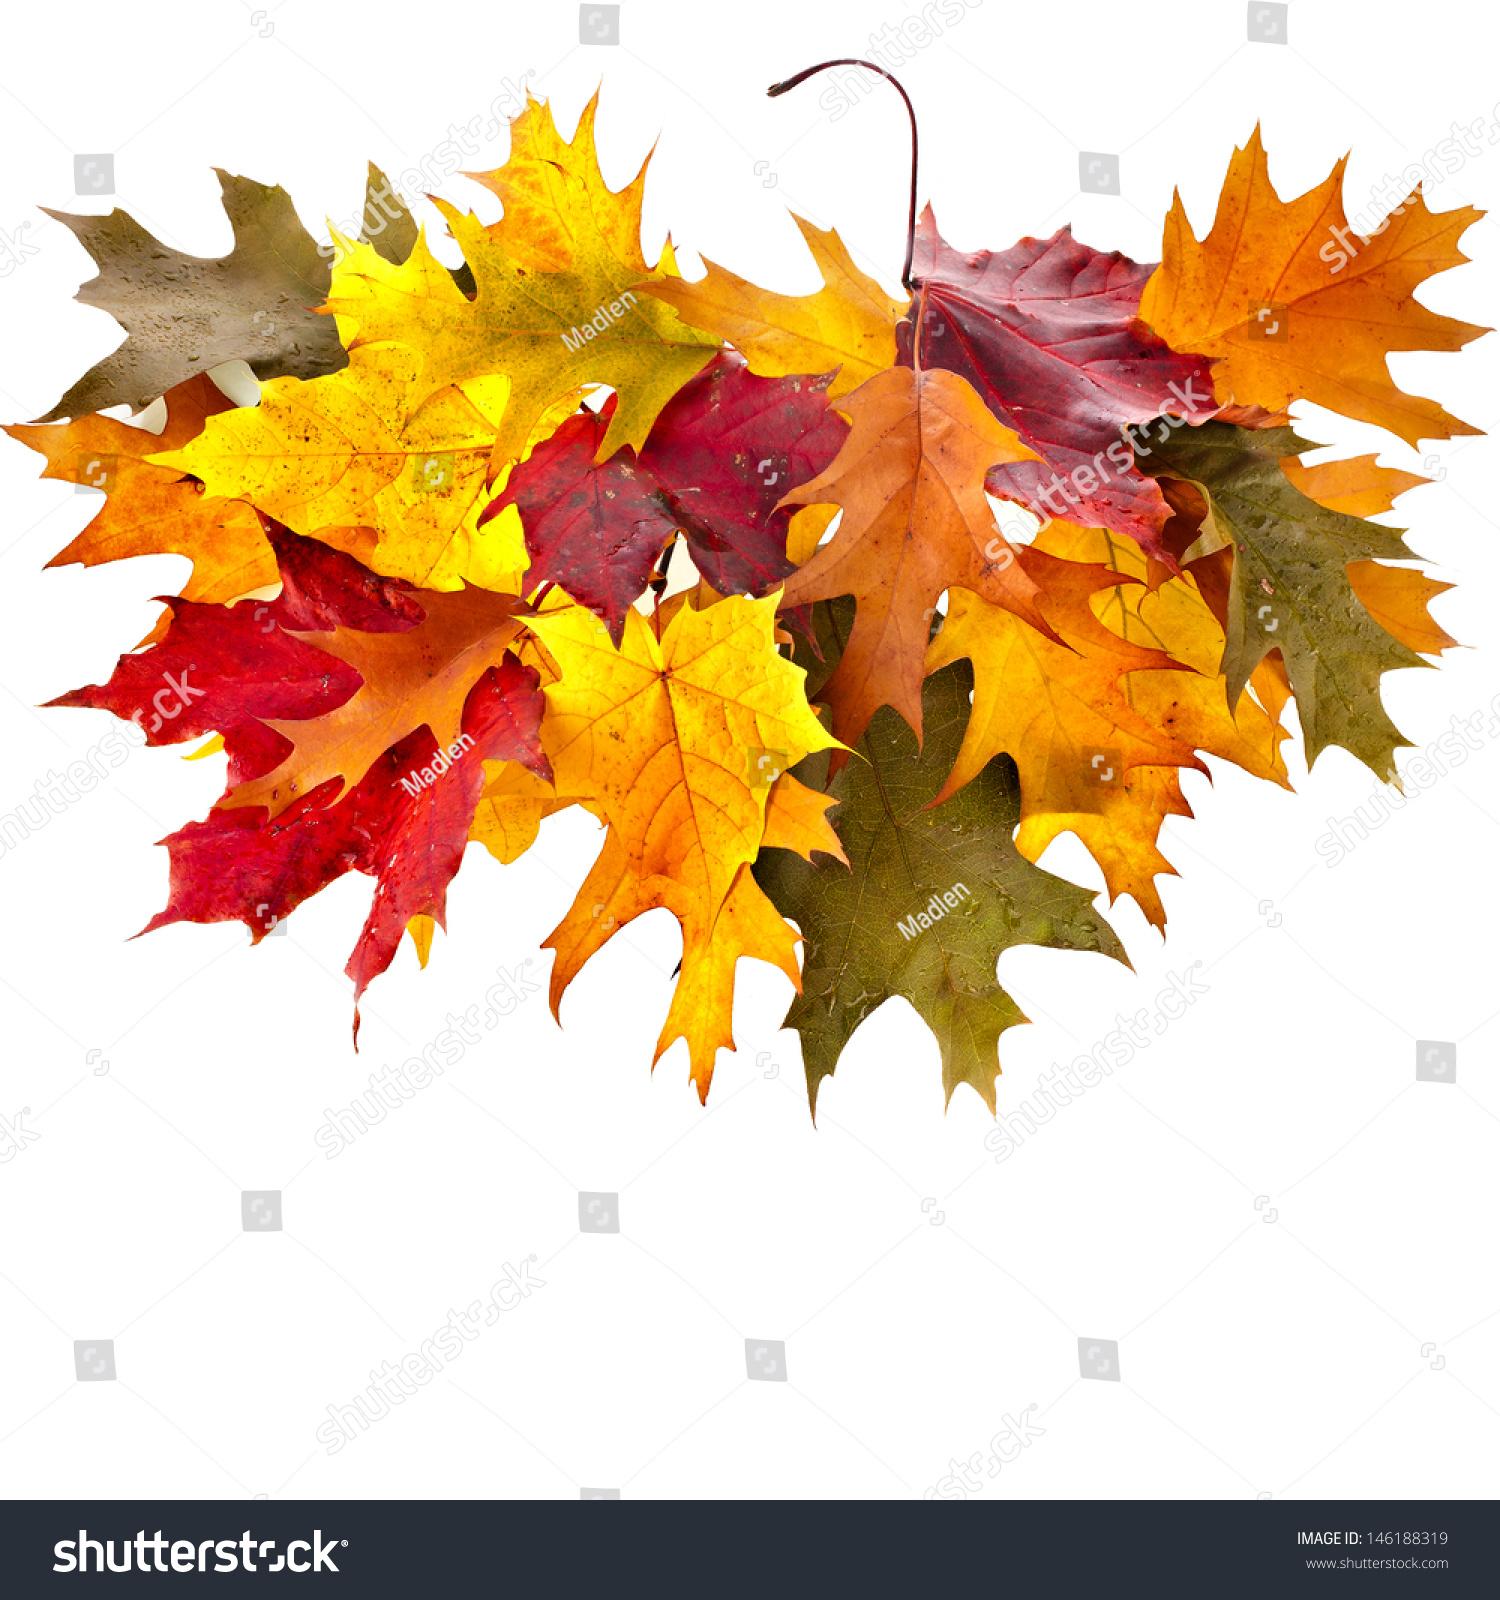 autumn fall tree backgrounds - photo #33